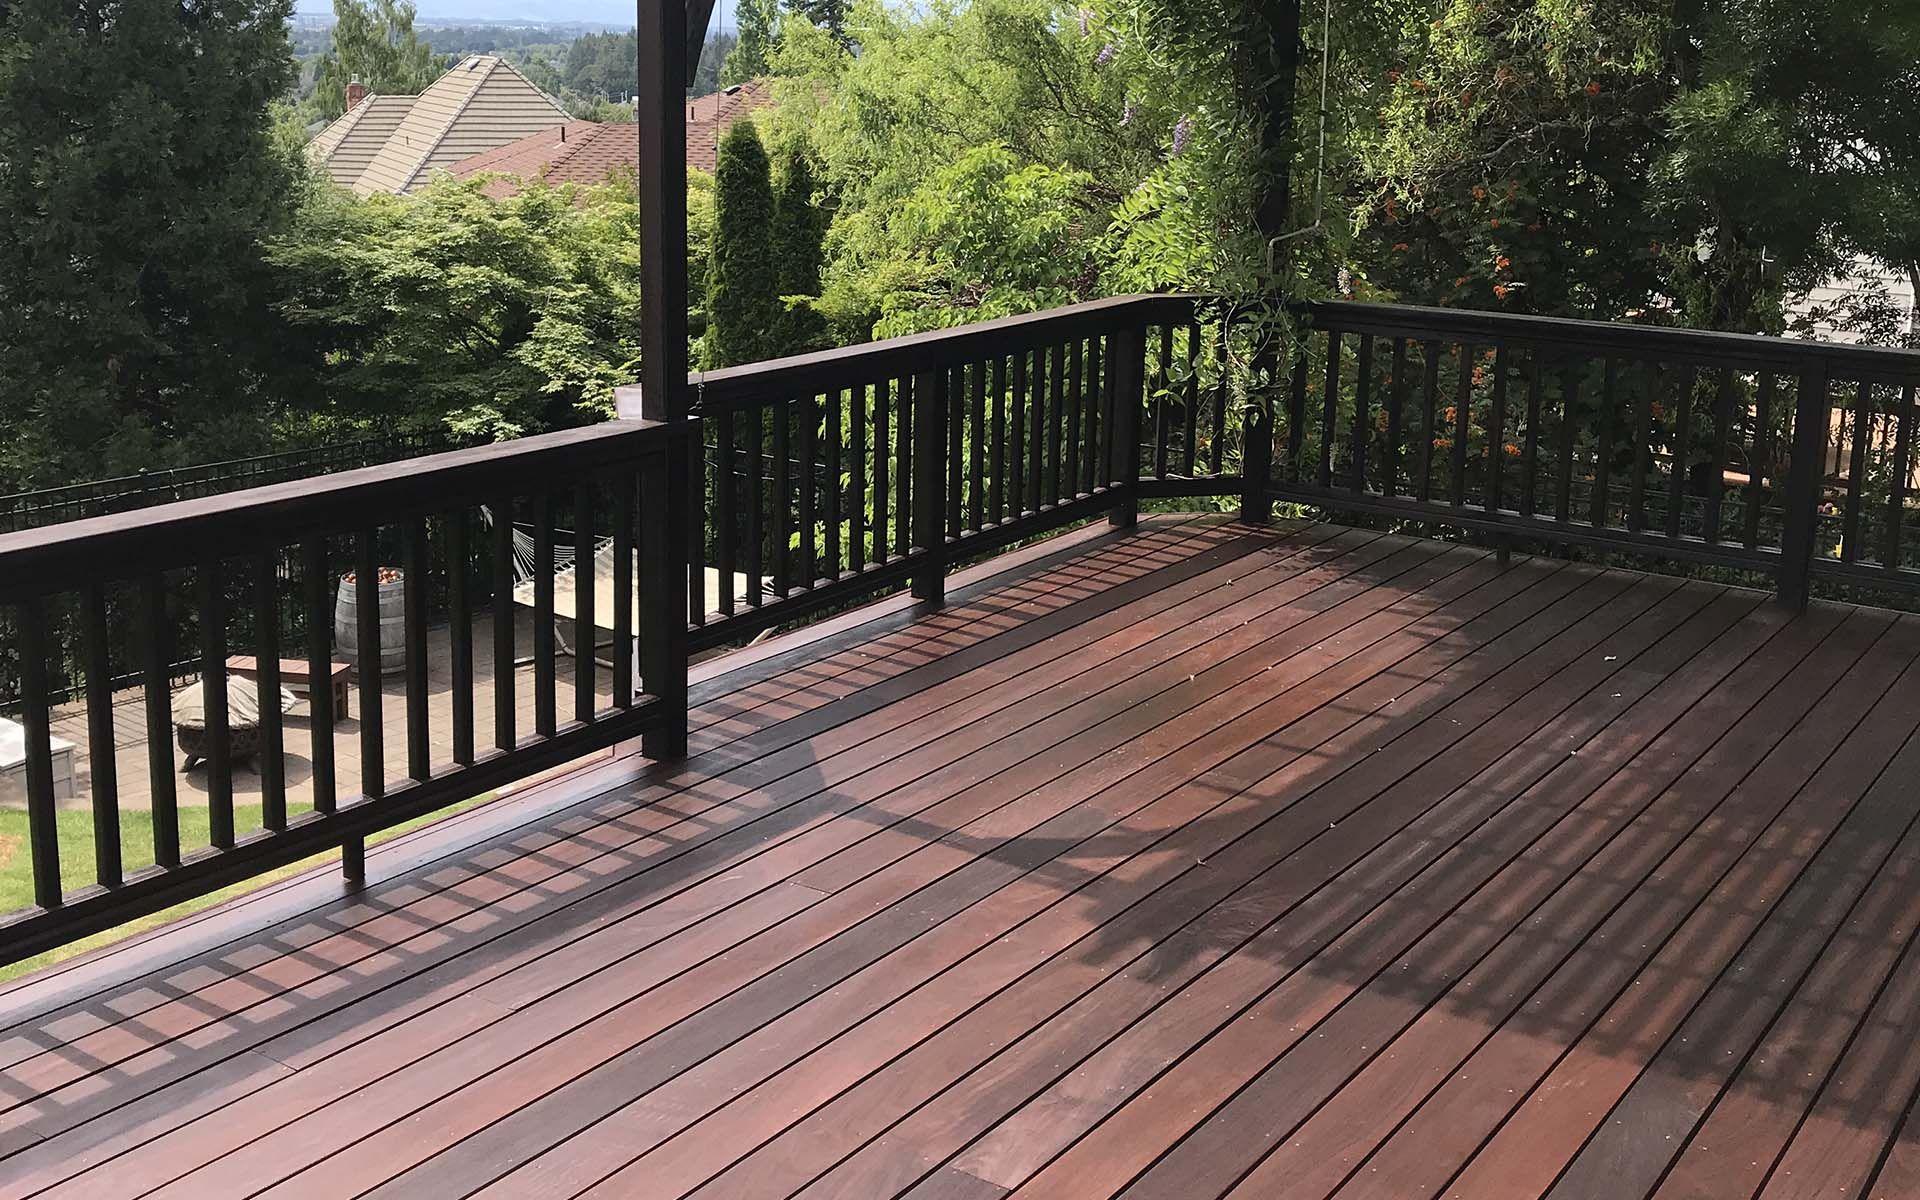 Hardwood_Decking_1. ipe-deck-exoshield-walnut.jpg in 2020   Wood deck, Hardwood  decking, Small deck patio